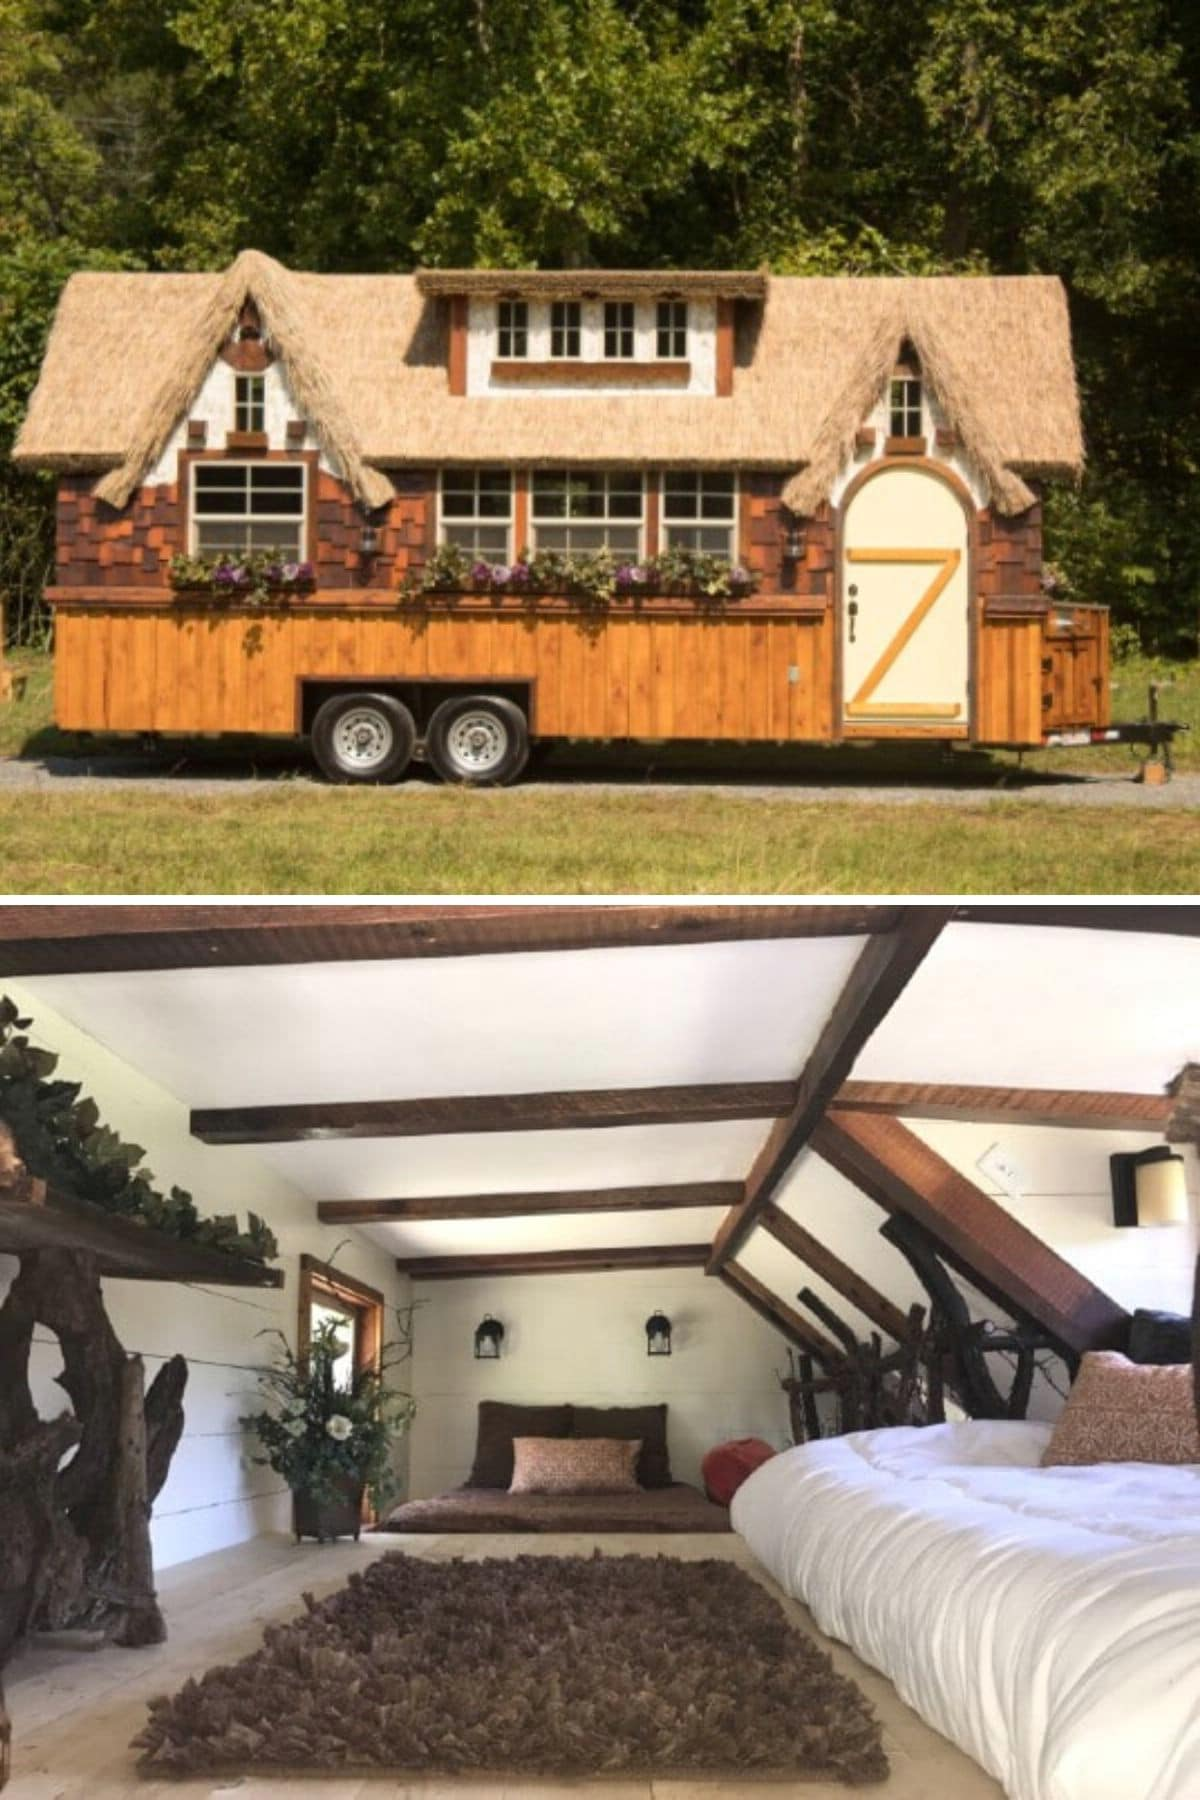 The Highland Tiny House